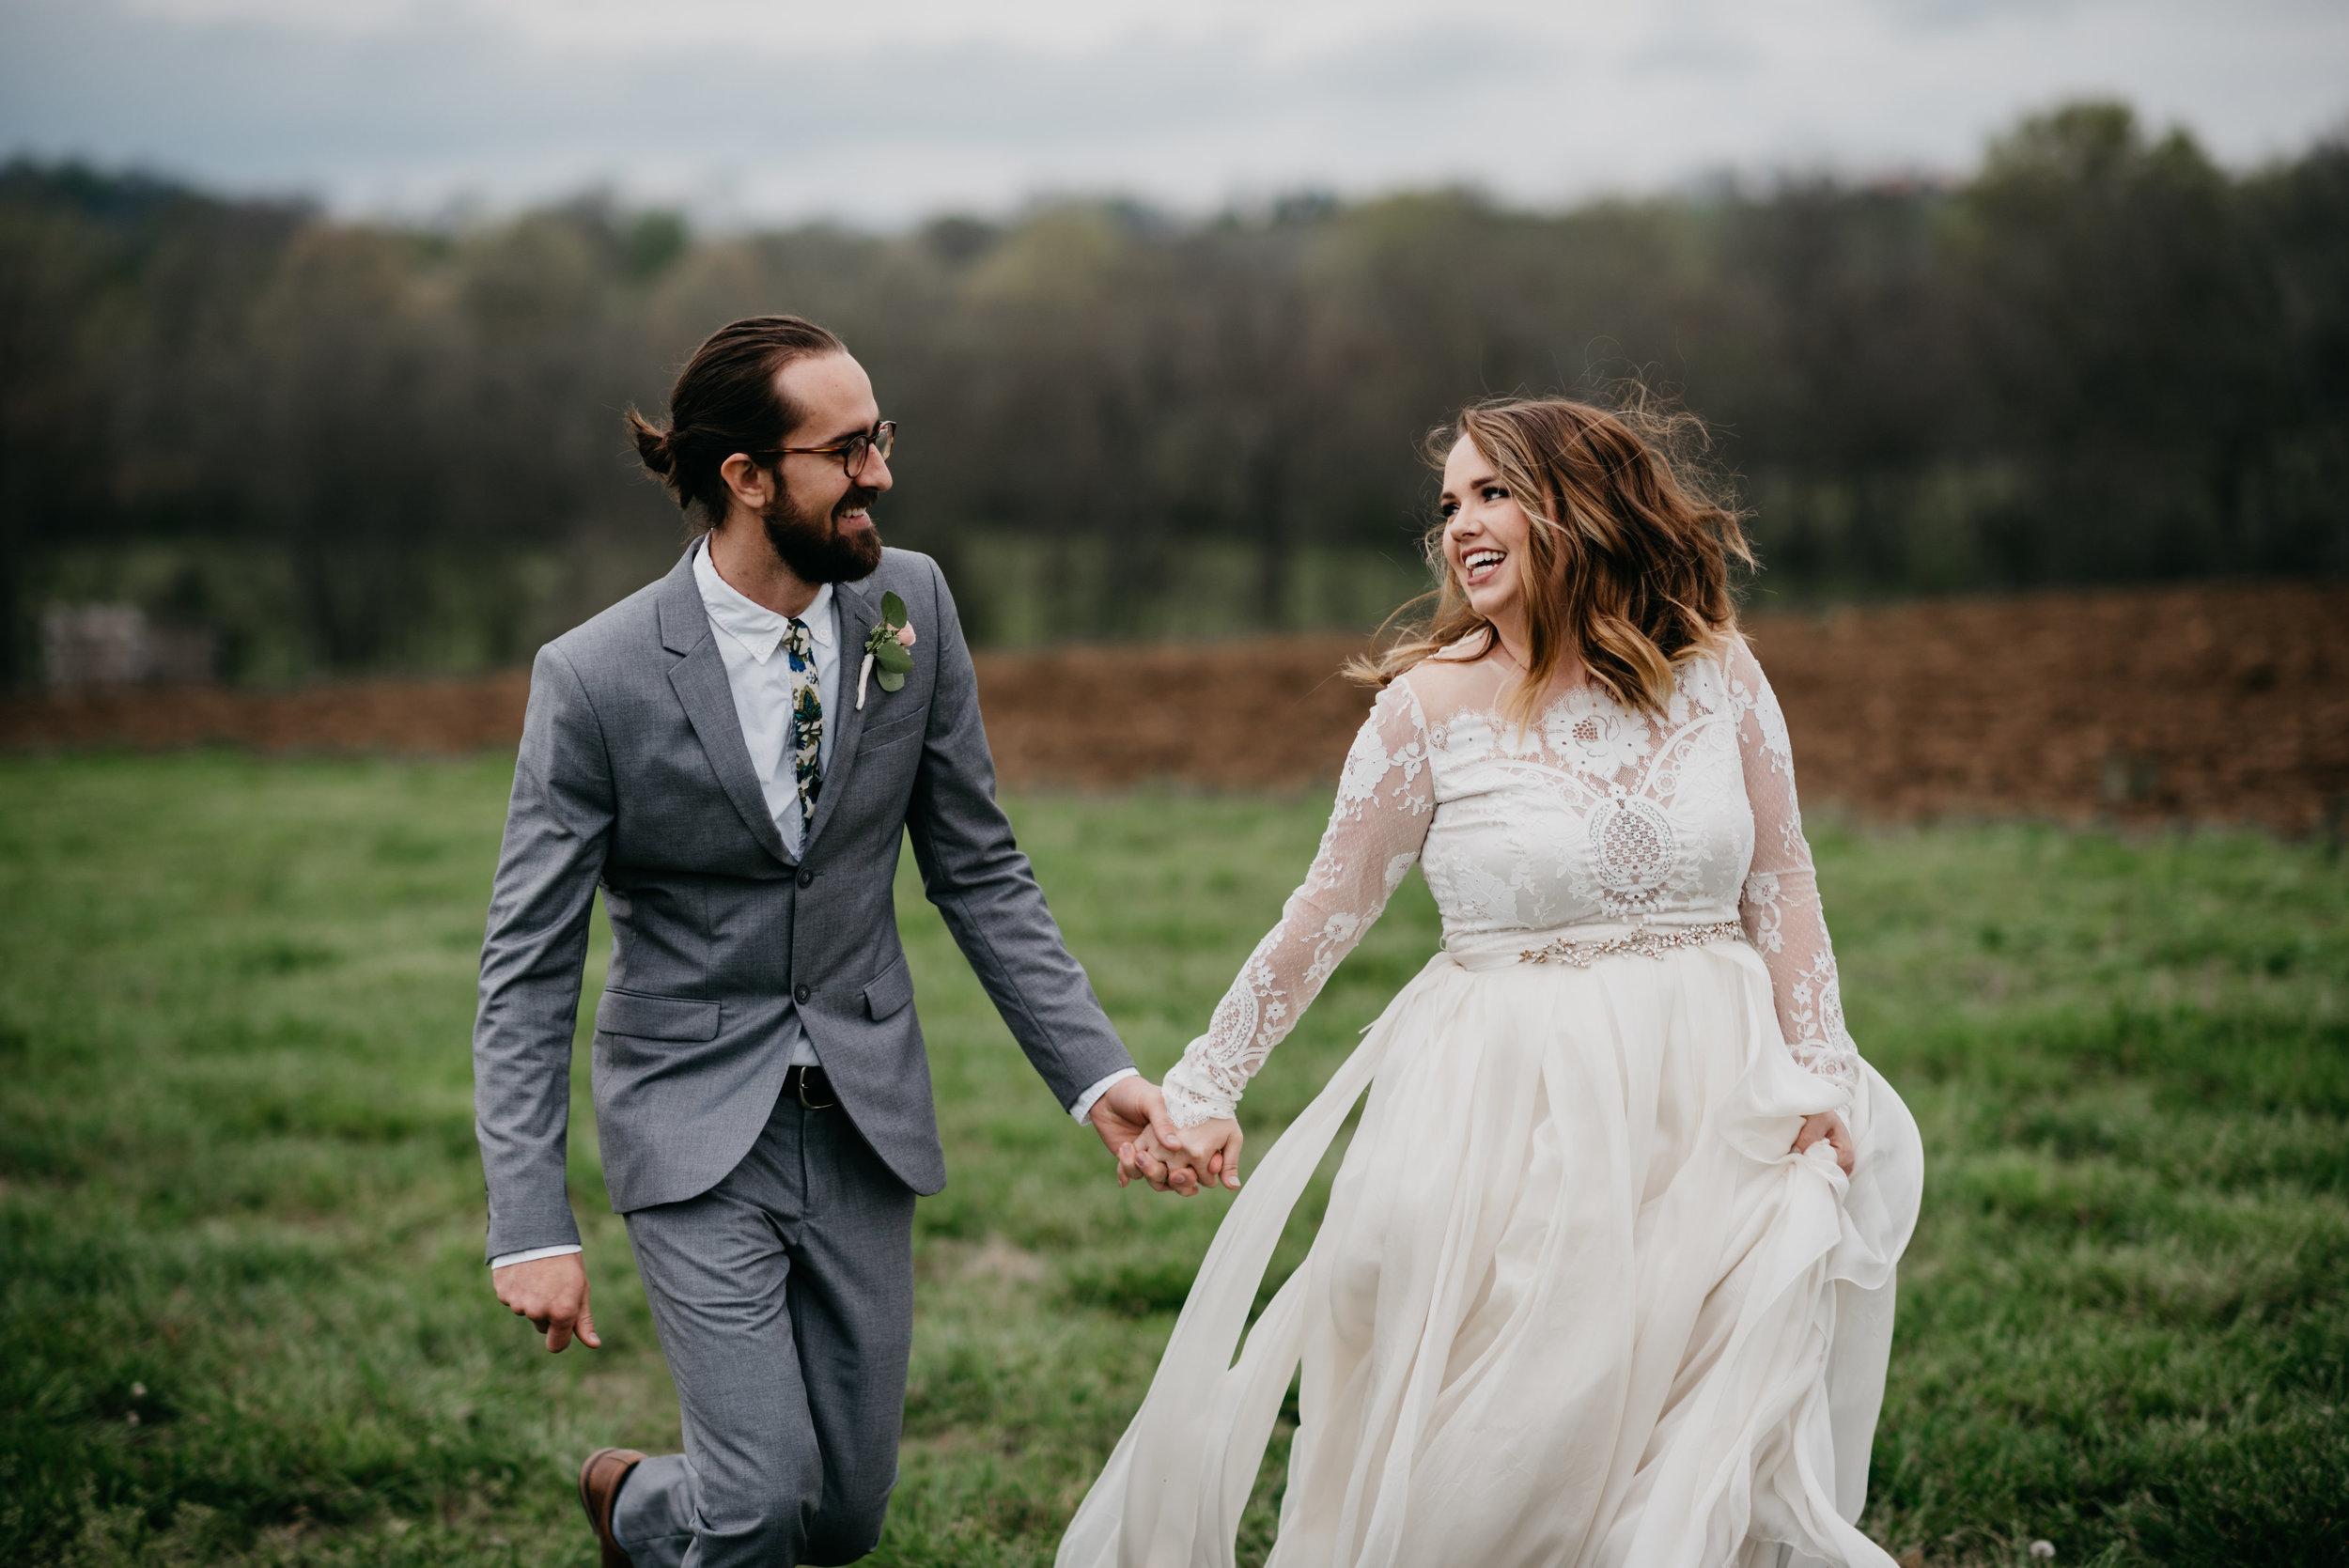 Allenbrooke-Farms-Nashville-Wedding-Photographers 15.jpg